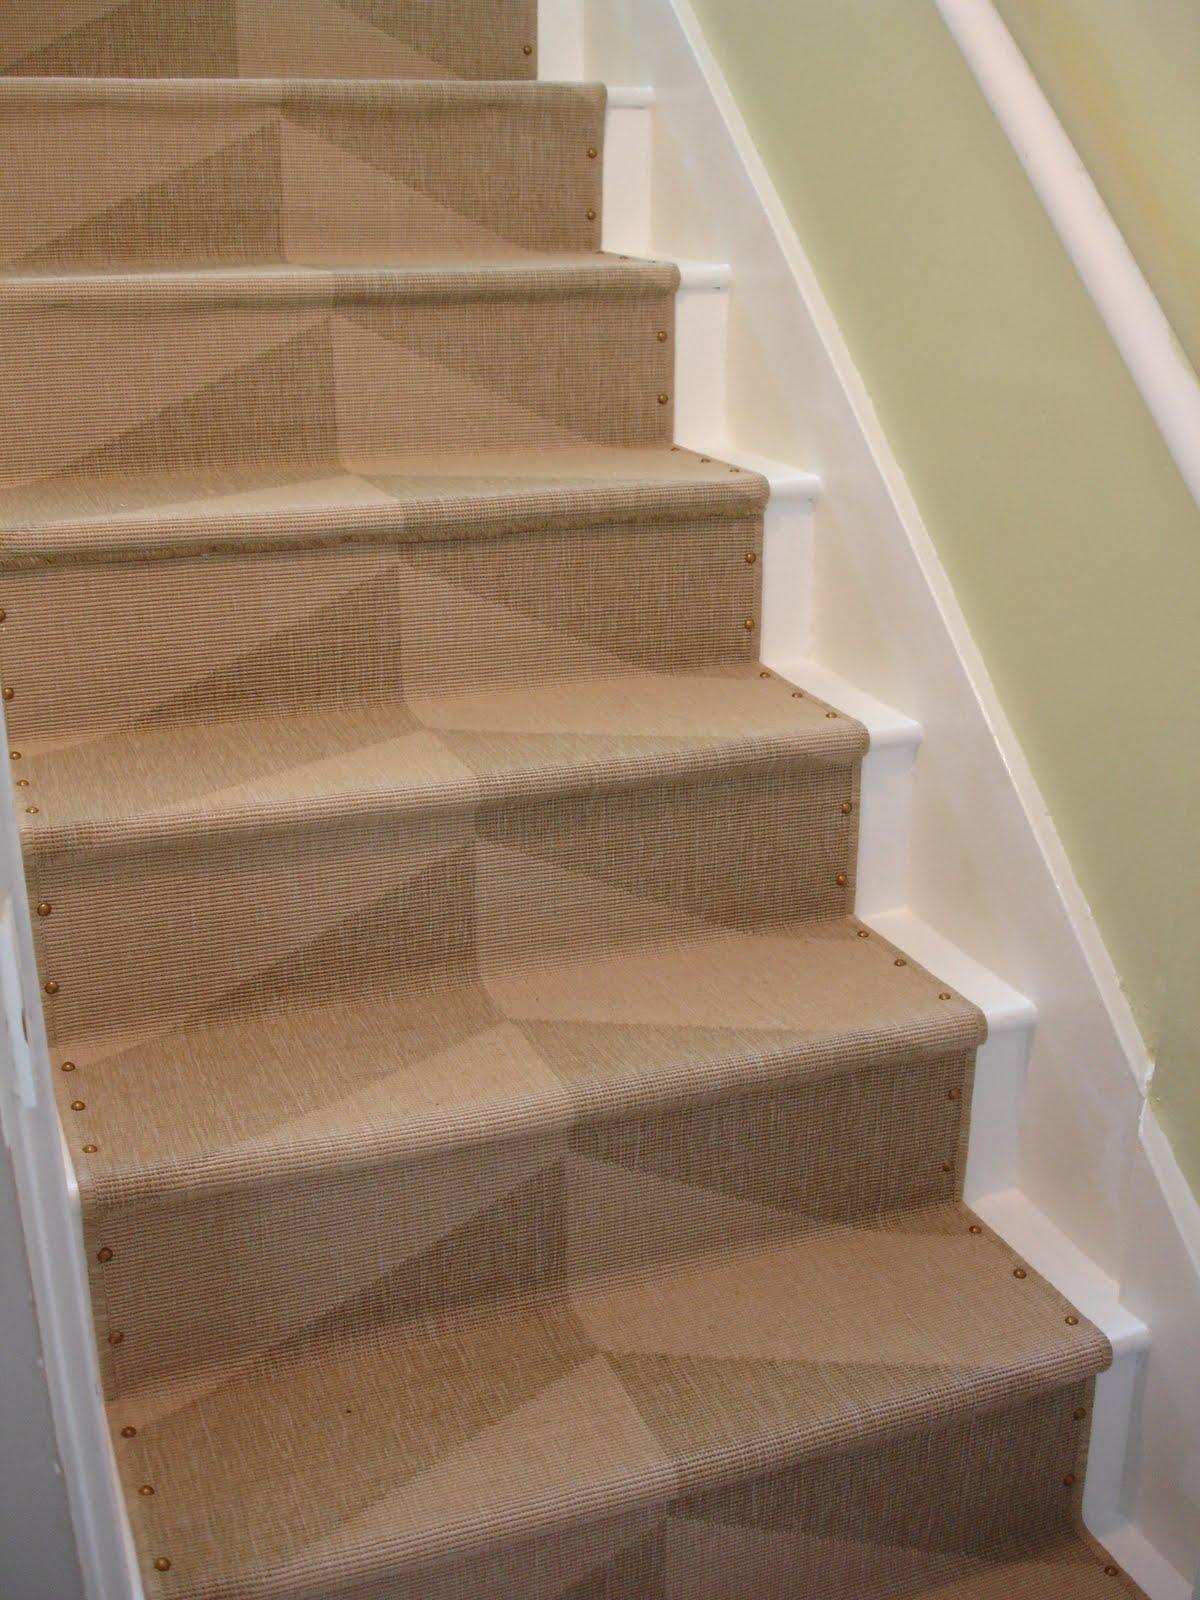 loft & cottage: diy nailhead stair runner